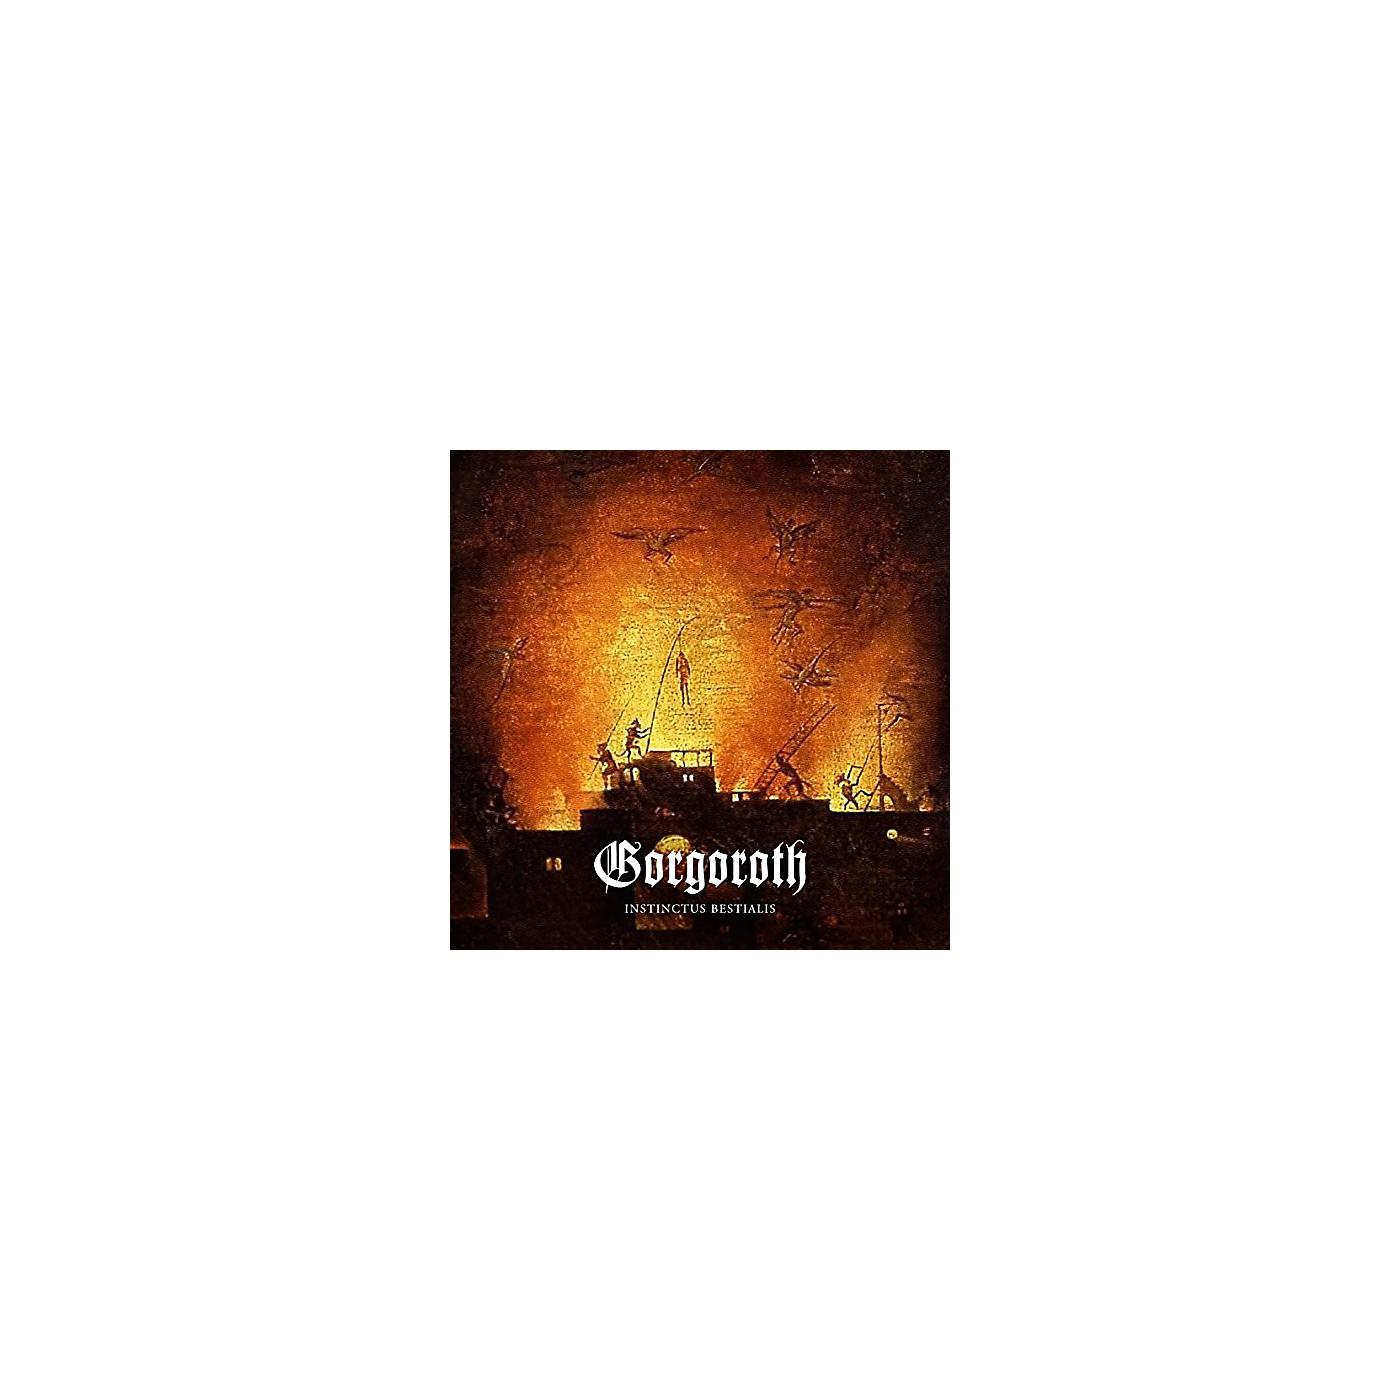 Alliance Gorgoroth - Instinctus Bestialis: Limited thumbnail